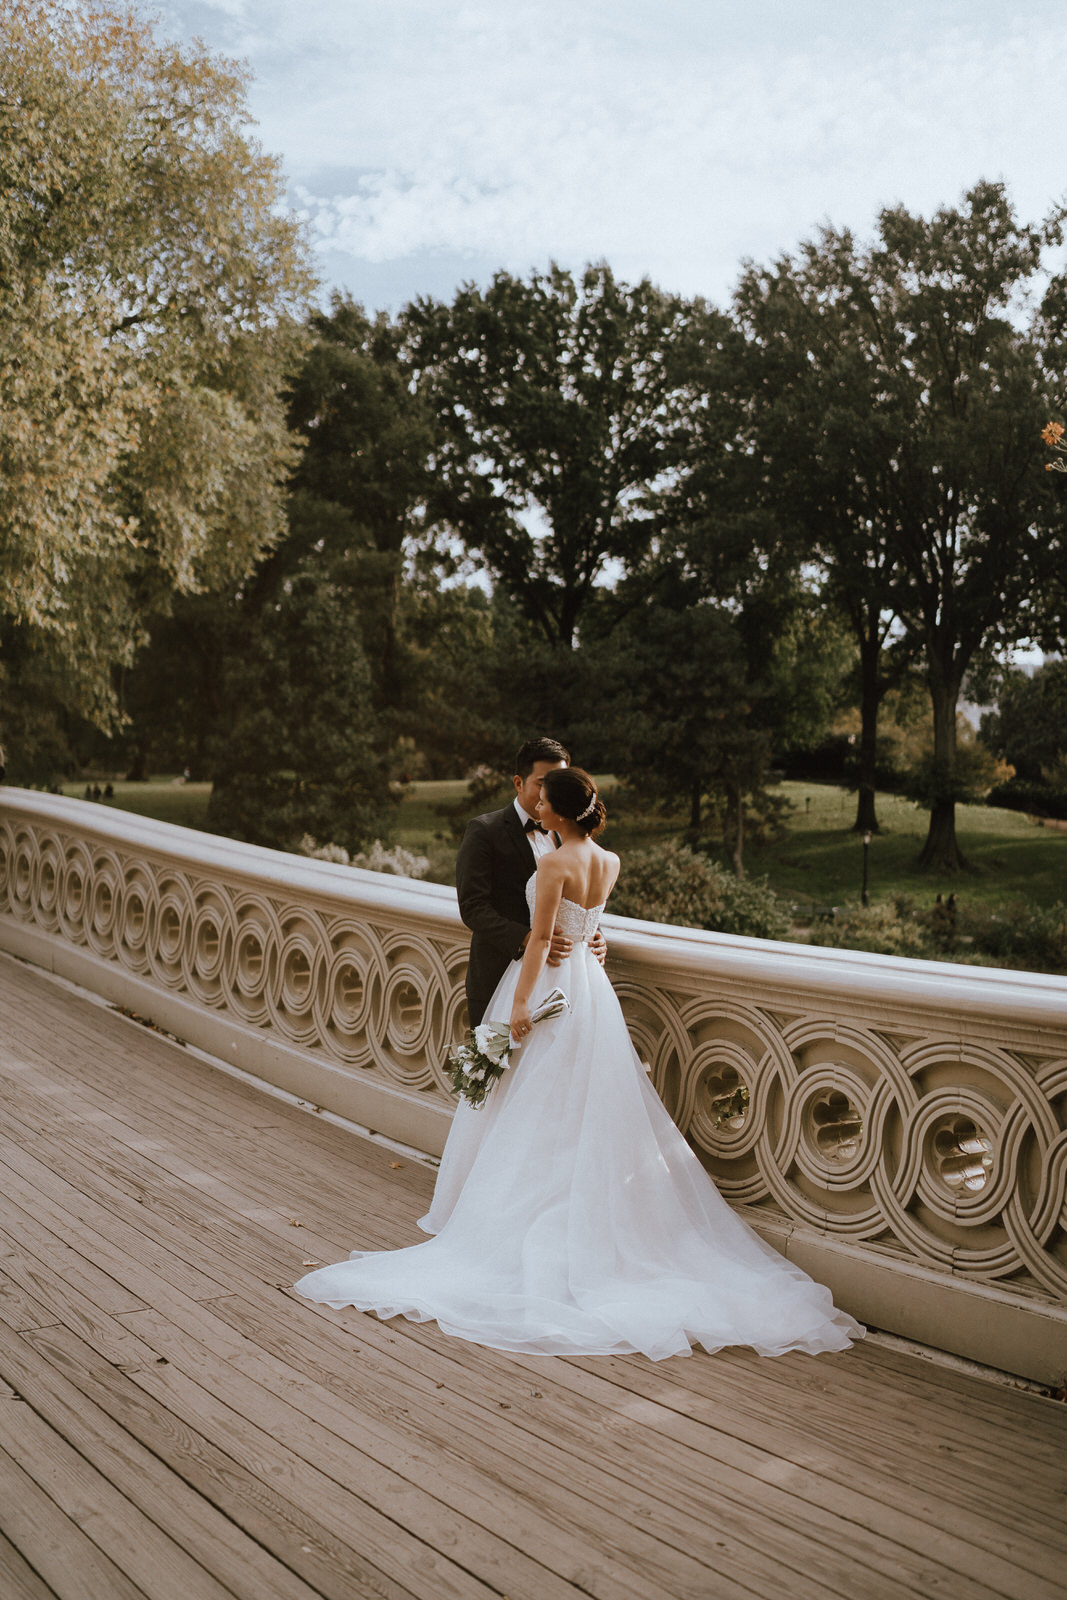 Central Park Elopement Photos-Bow Bridge-Michelle Gonzalez Photography- New York Wedding Photographer-23.jpg